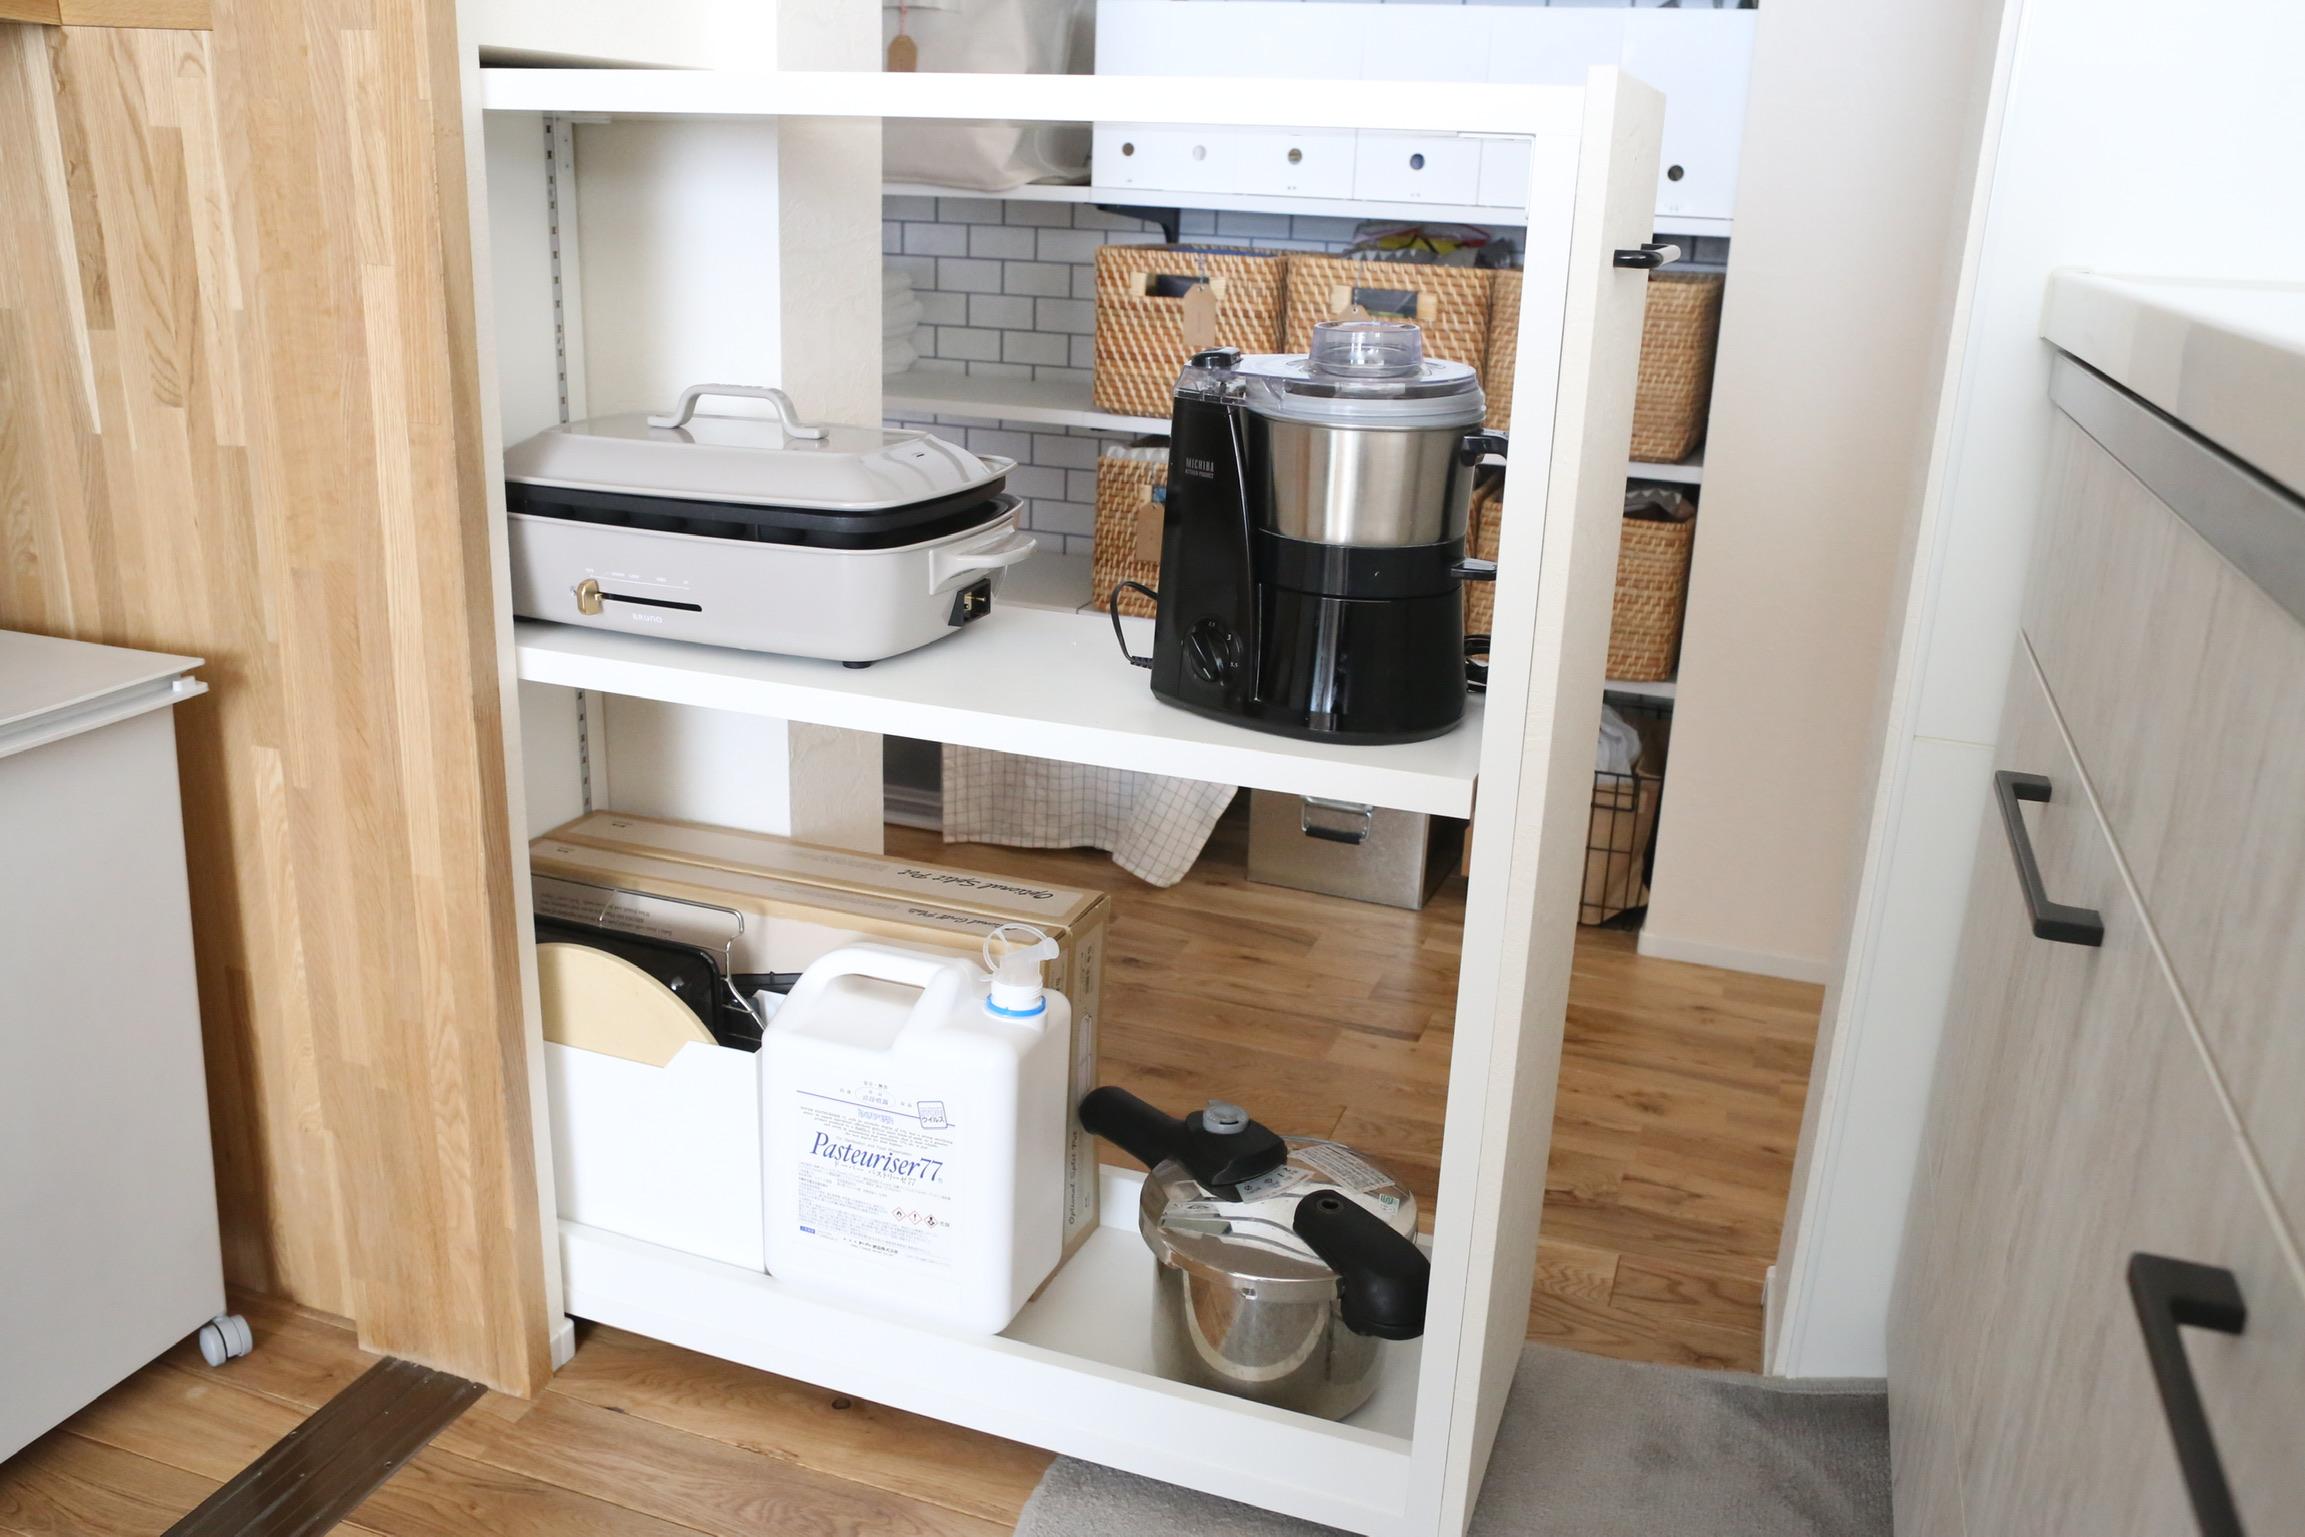 《web内覧会2019》キッチン背面収納4  必ず驚かれる隠れ収納